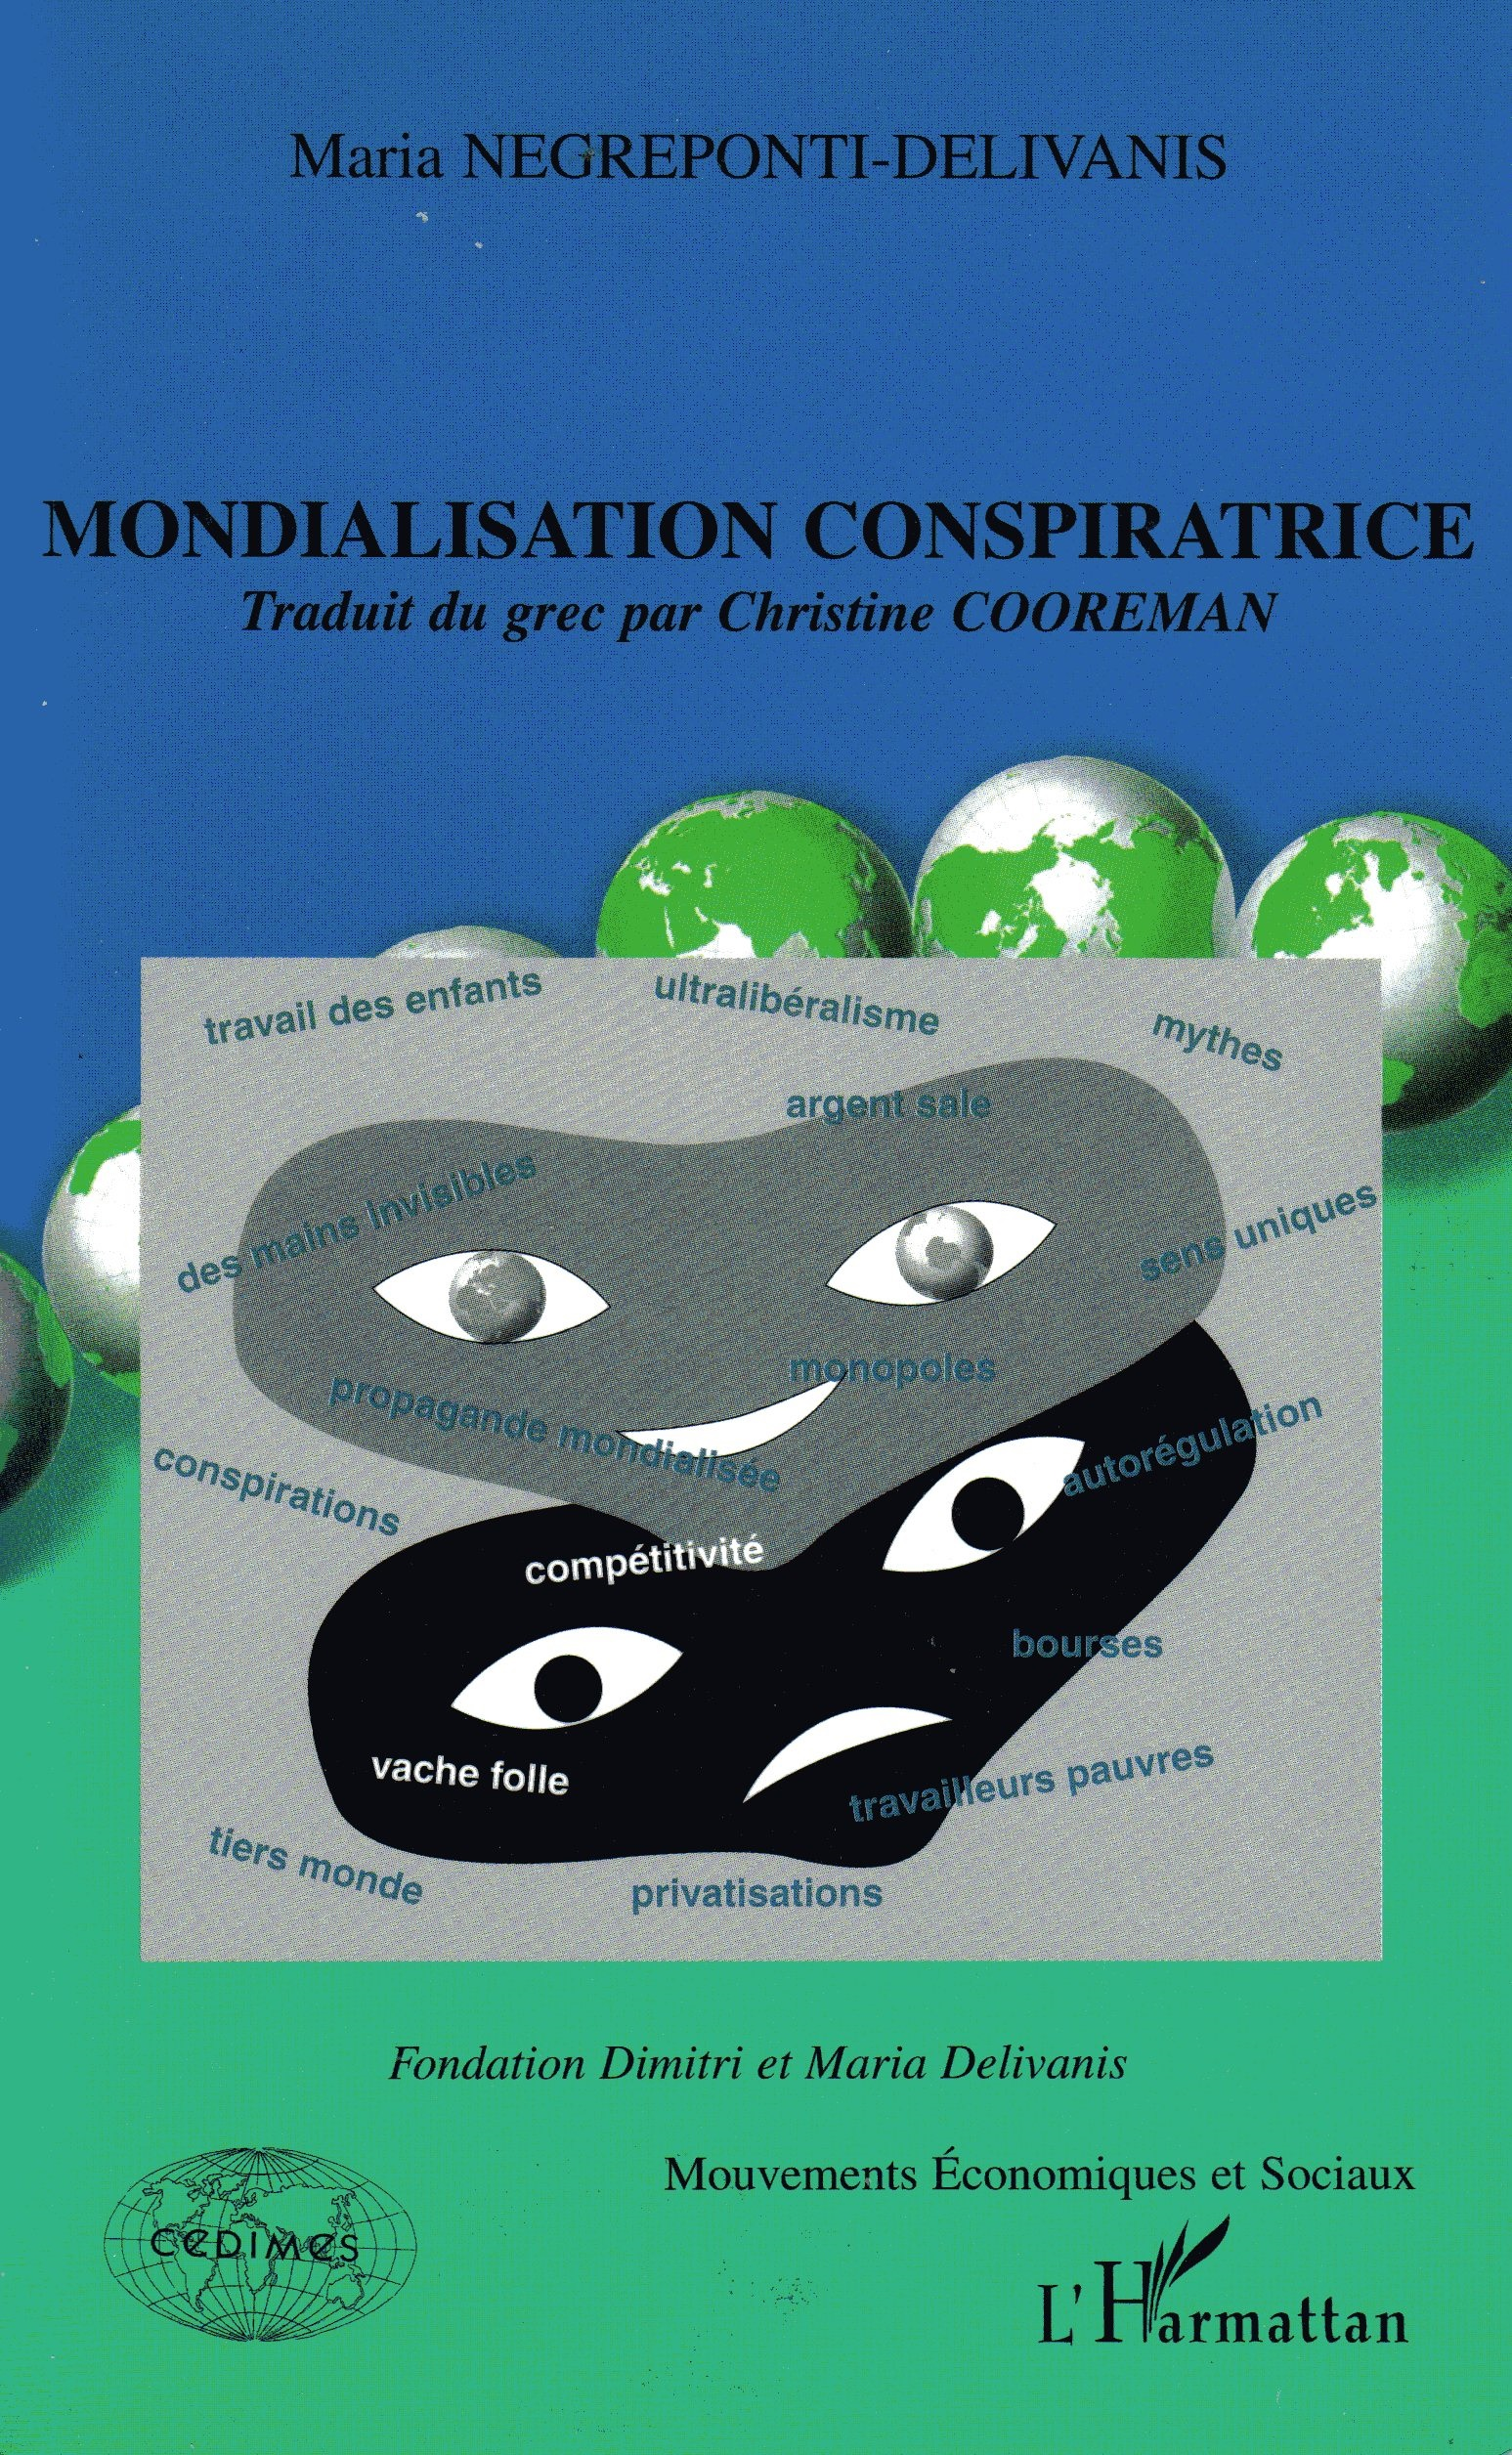 MONDIALISATION CONSPIRATRICE